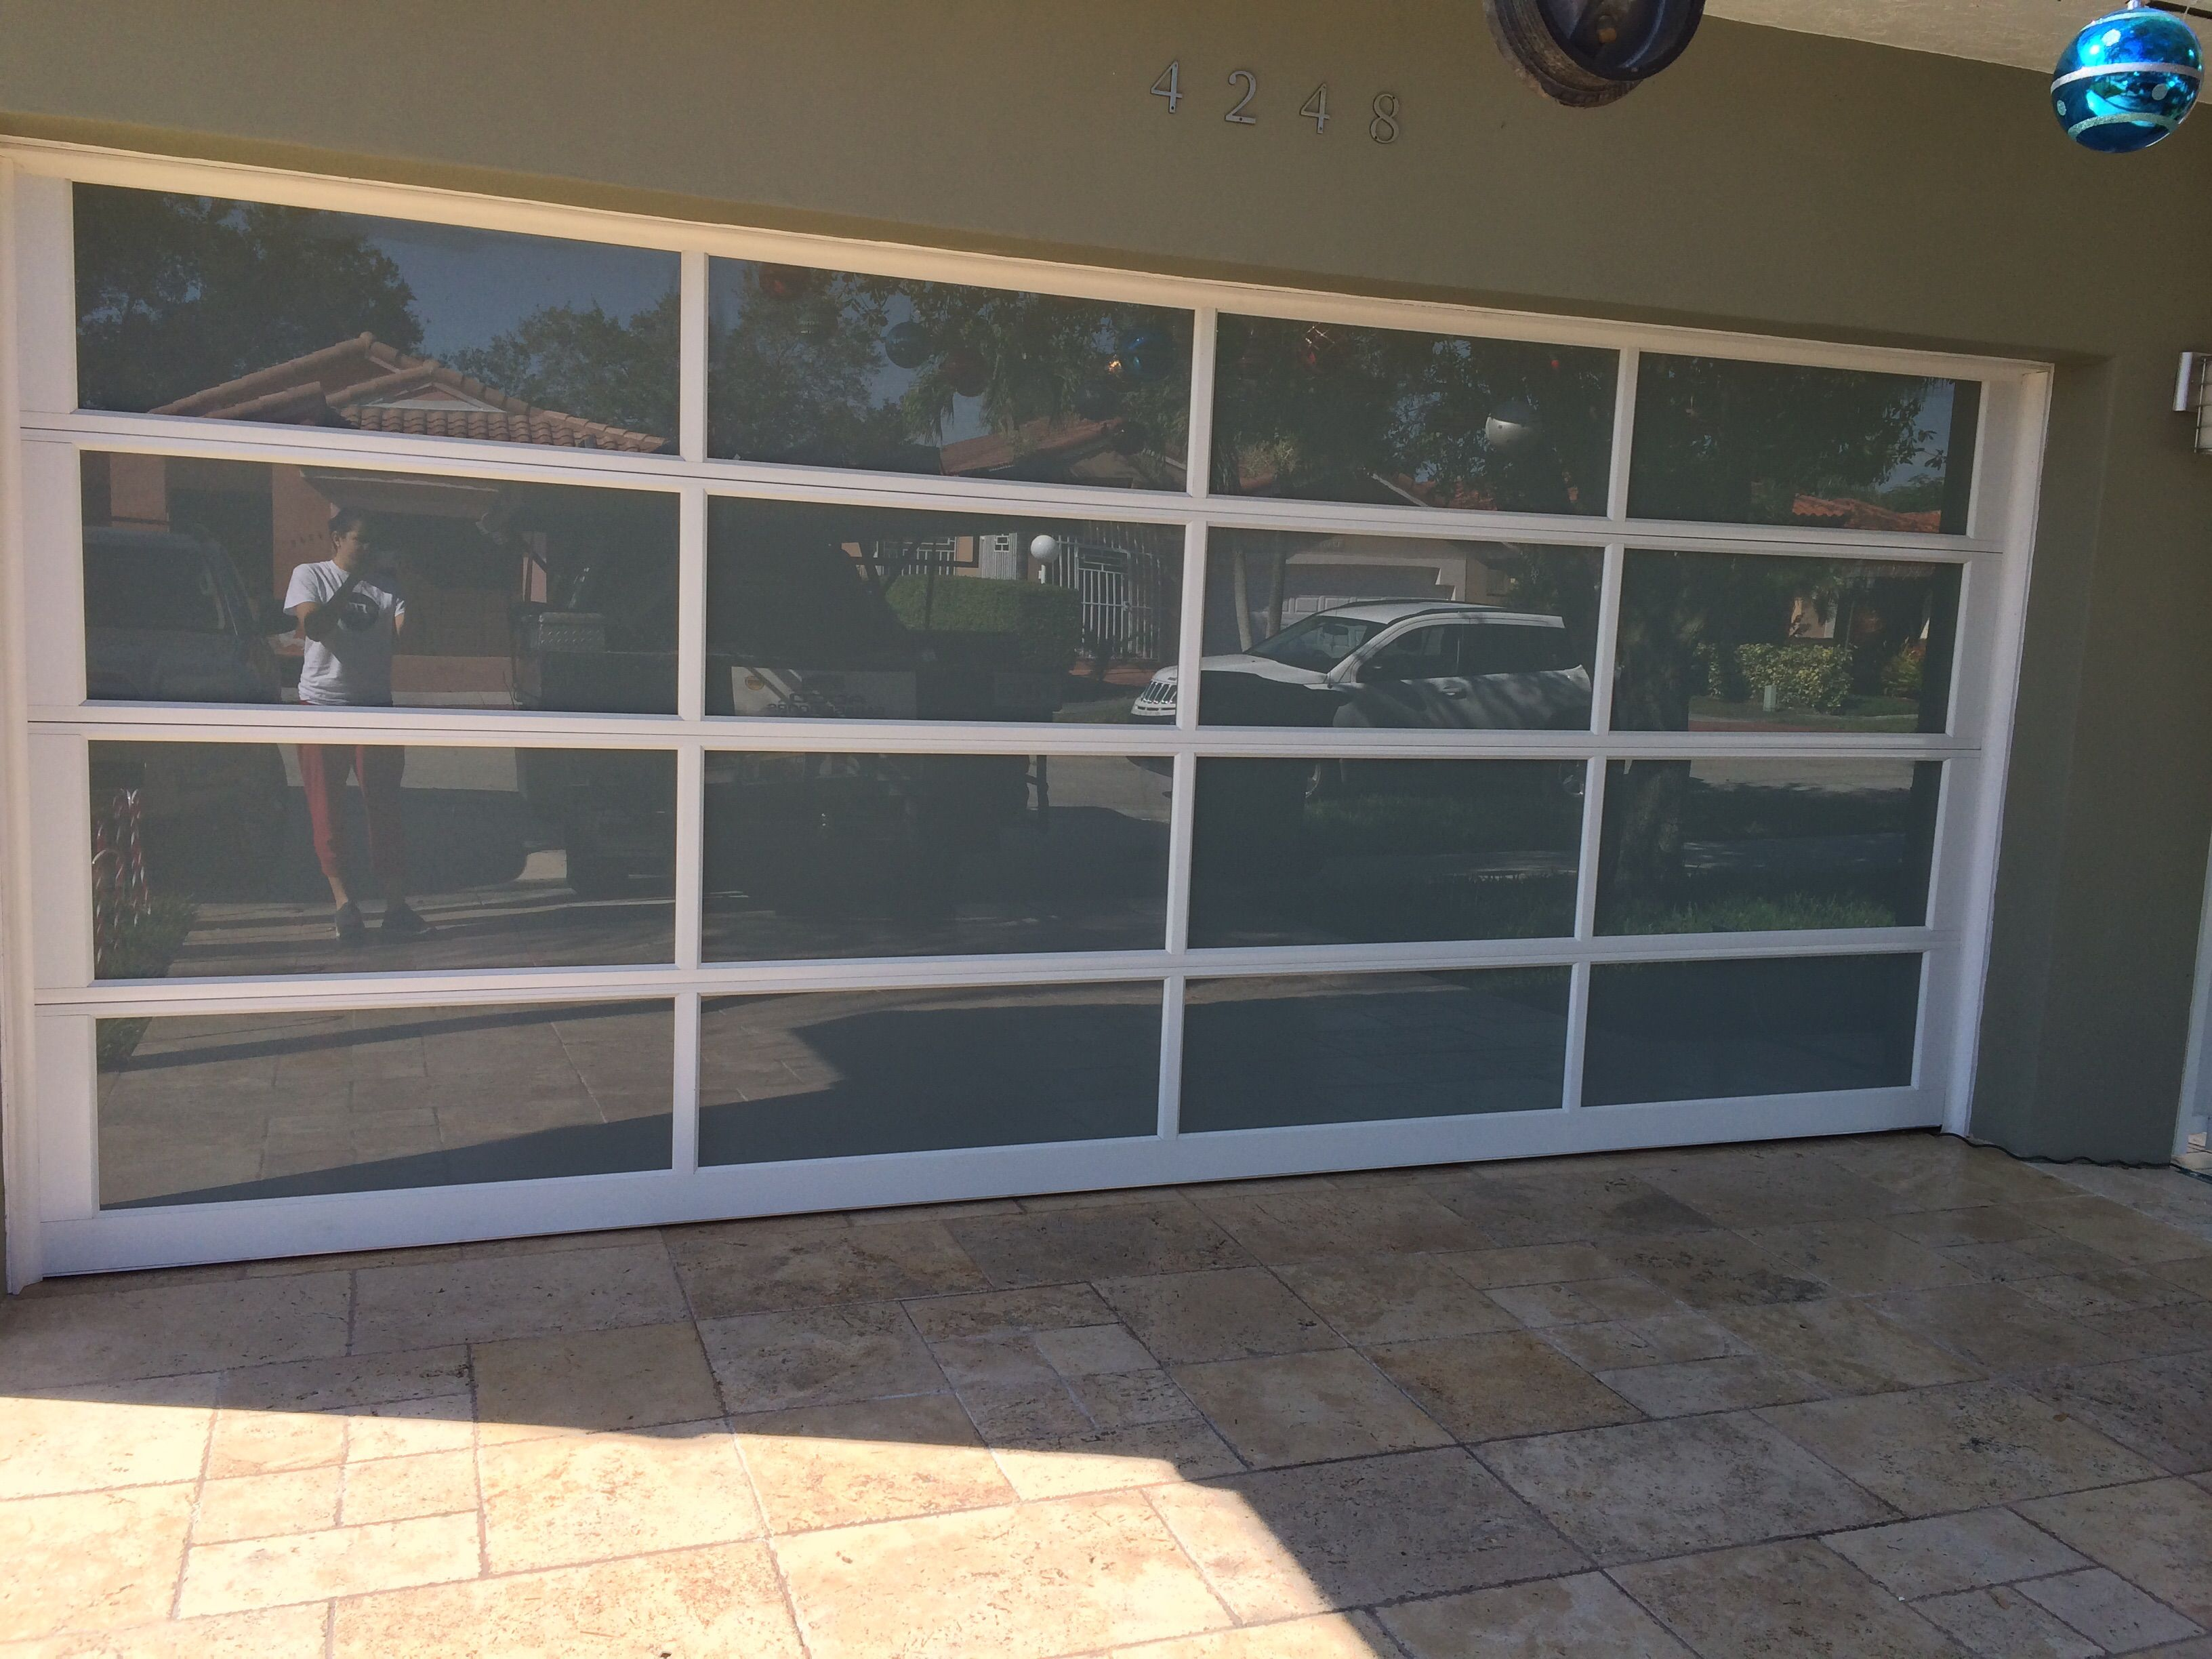 Puerta De Garaje Instalada Por Adco Modelo Avante Fabricada Clopay Super Moderna Llamarnos Para Mayor Informacion Www Adcodoors